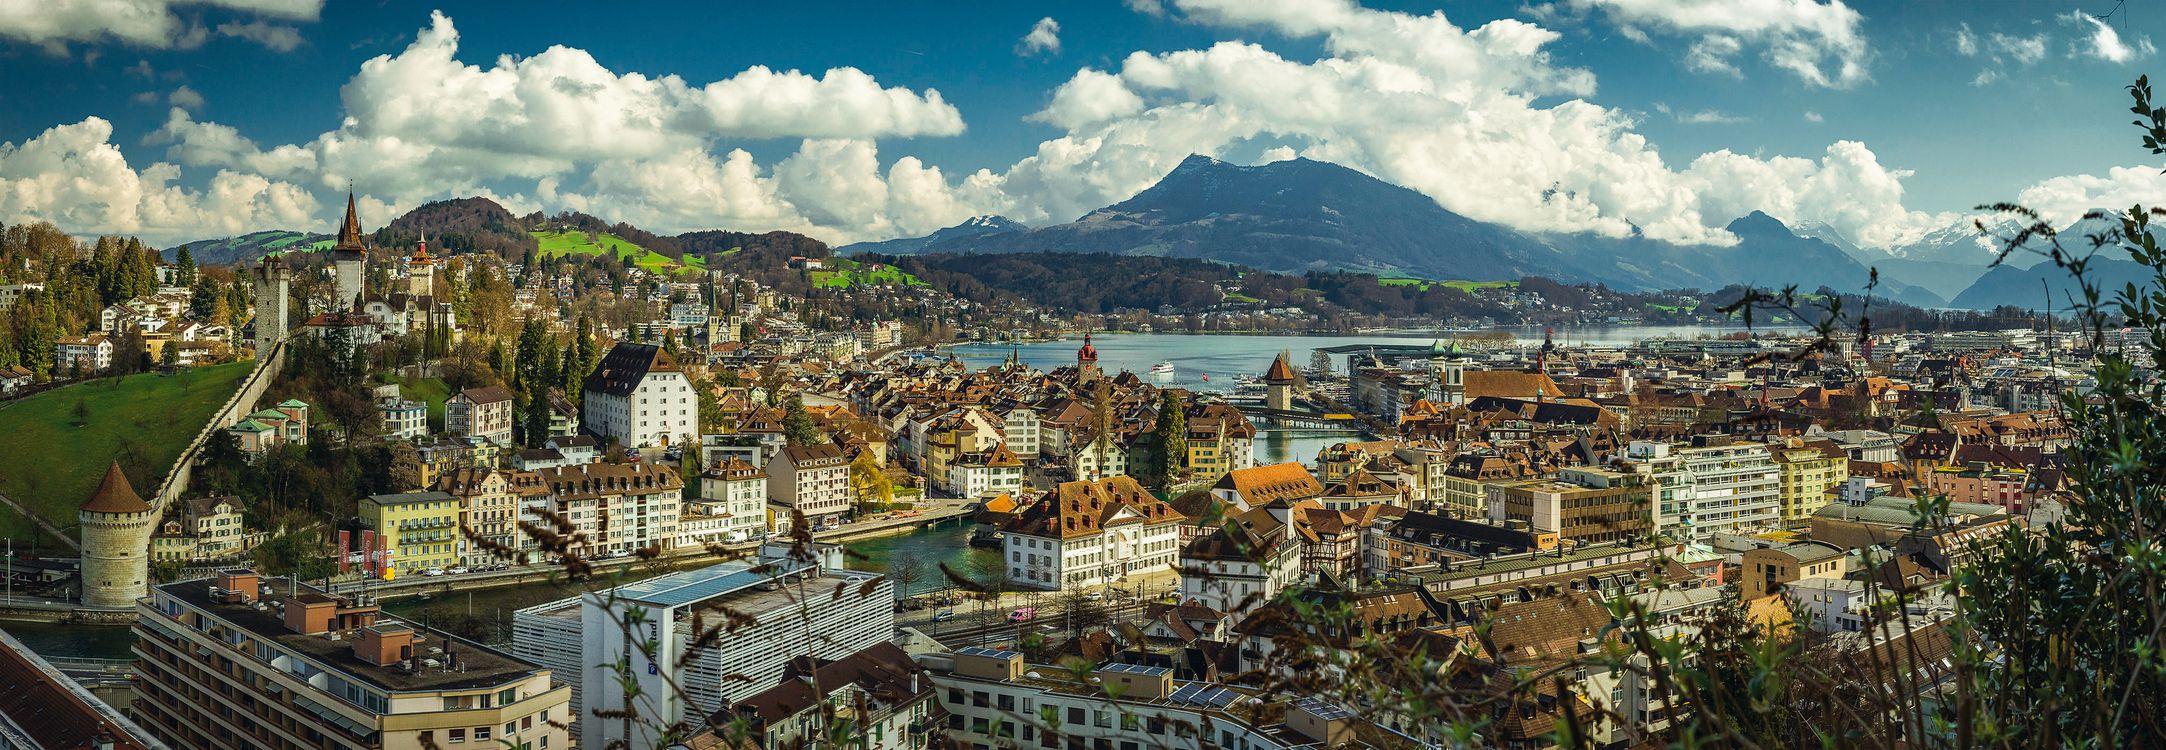 Фото бесплатно Panorama, Lucerne, Switzerland - на рабочий стол